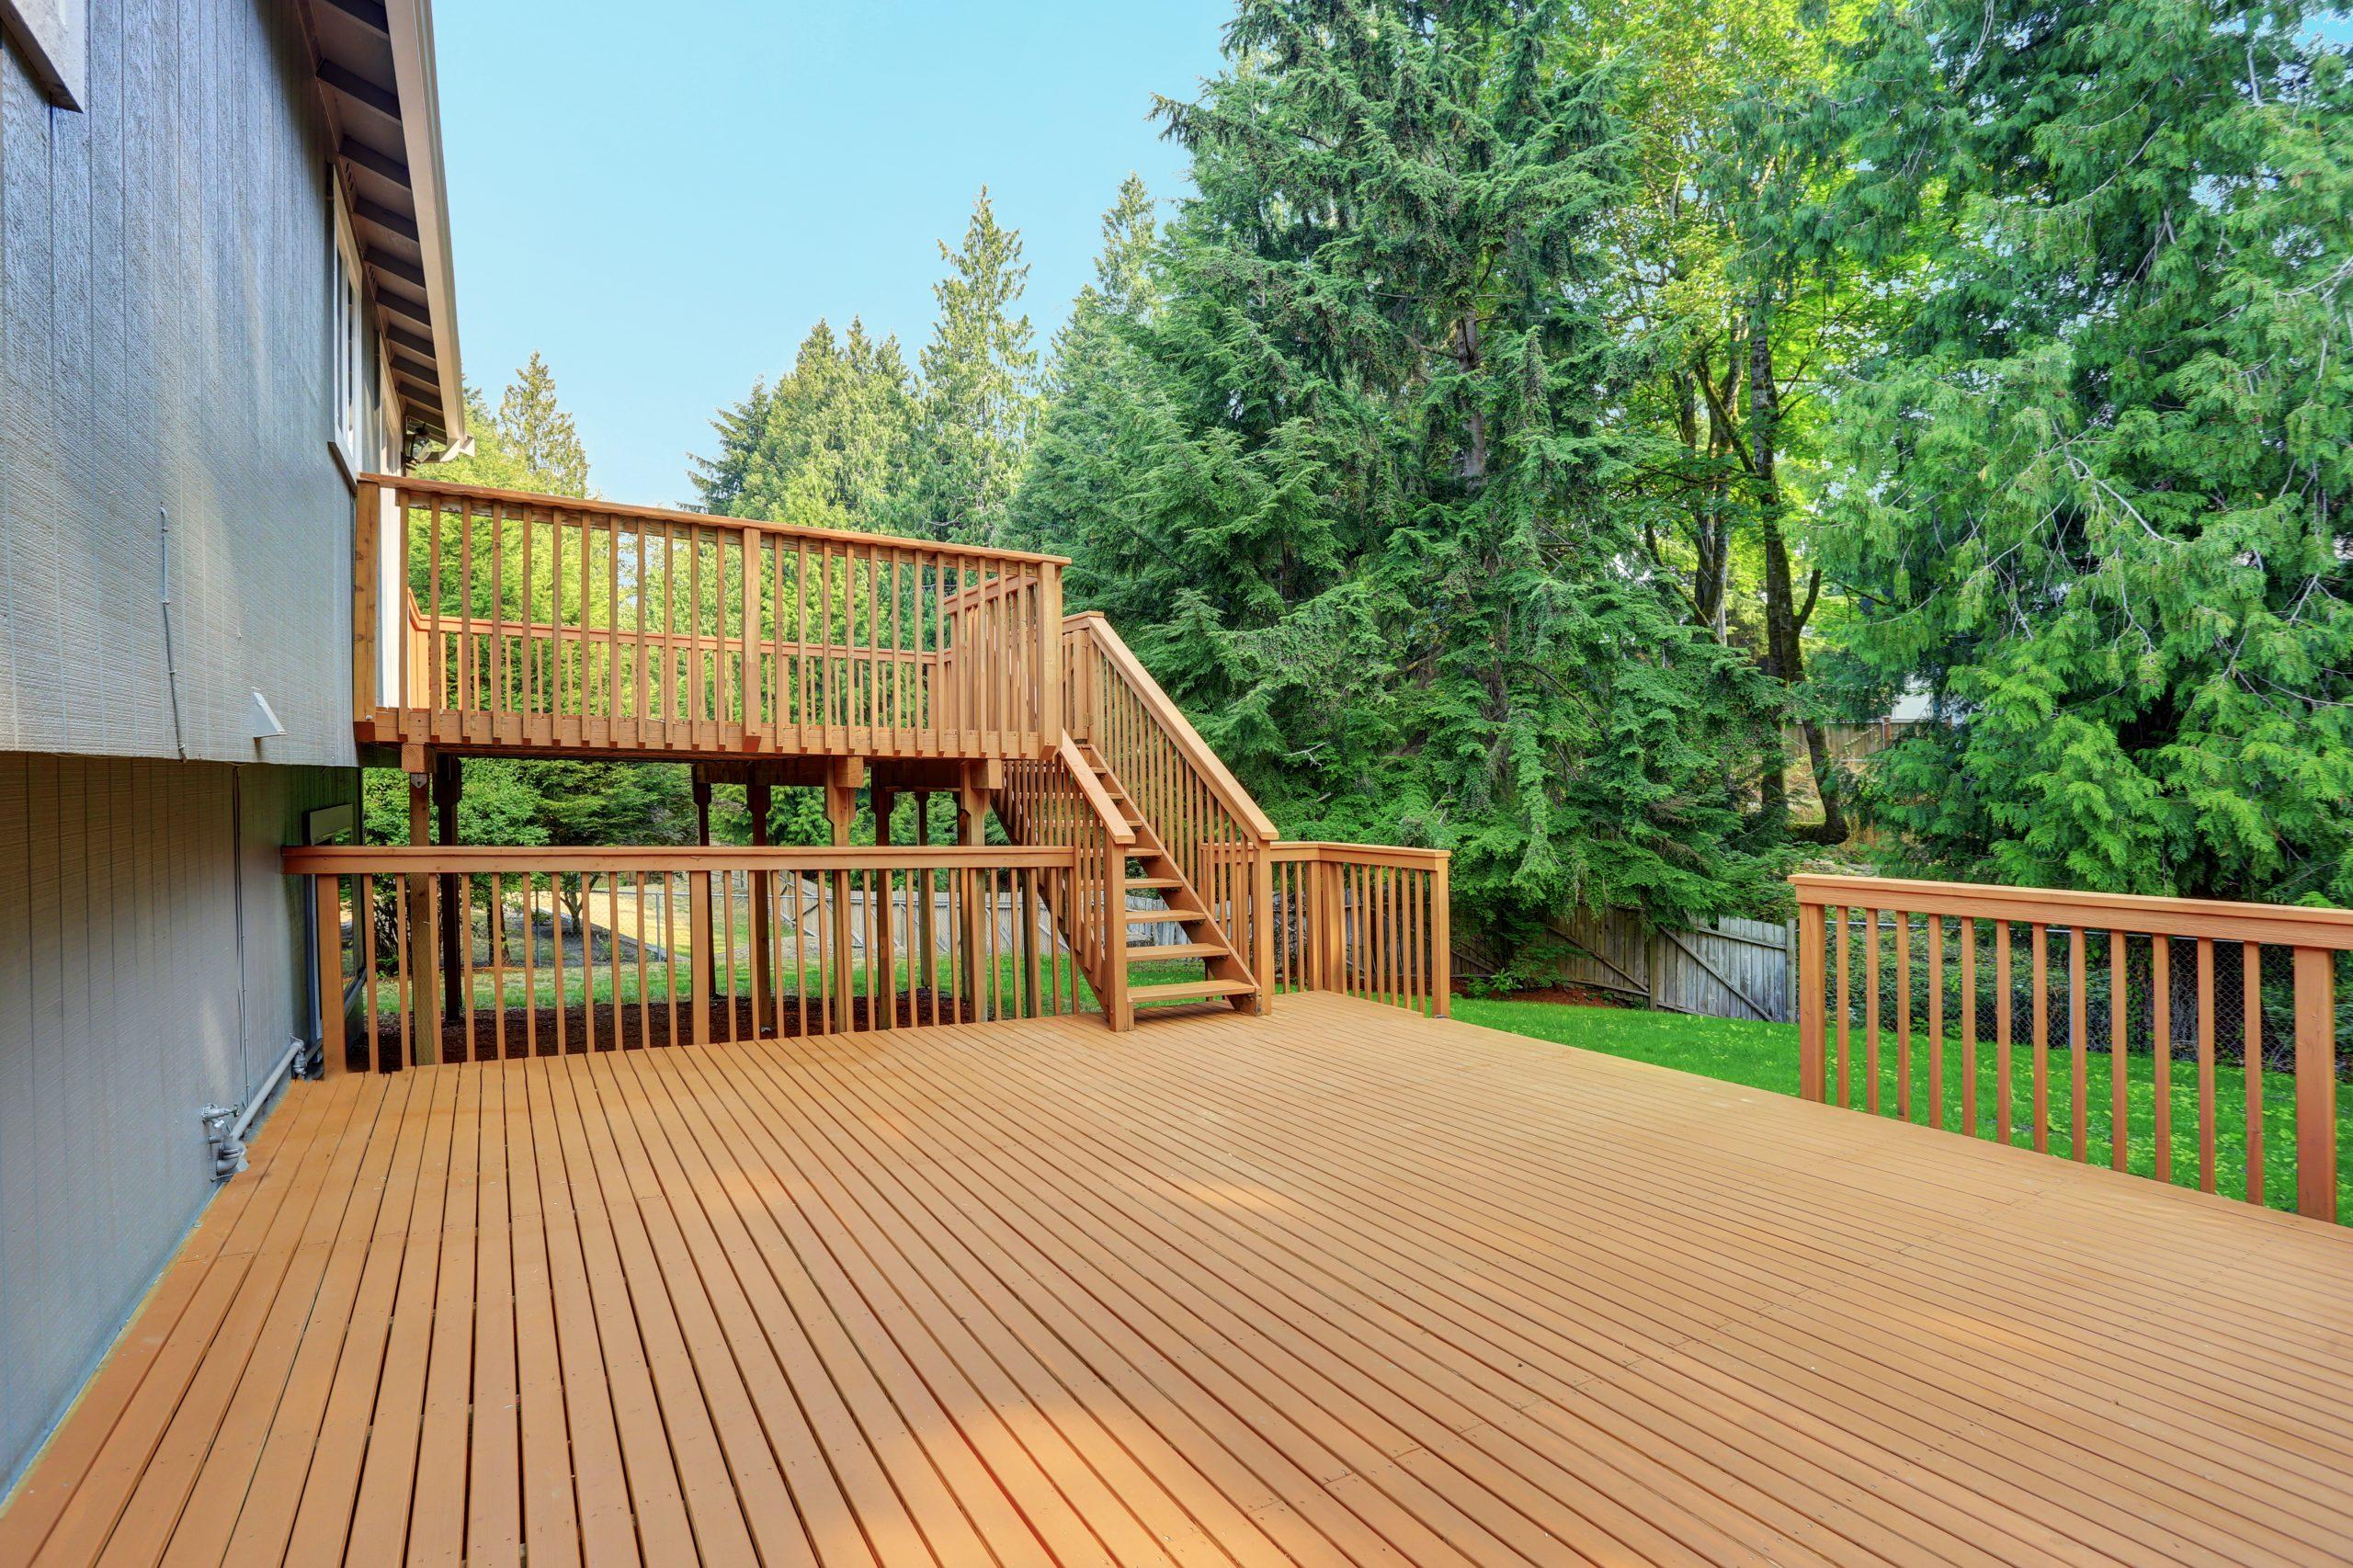 cedar decking deck builder lexington kentucky wood decks contractor contractors professional top quality #1